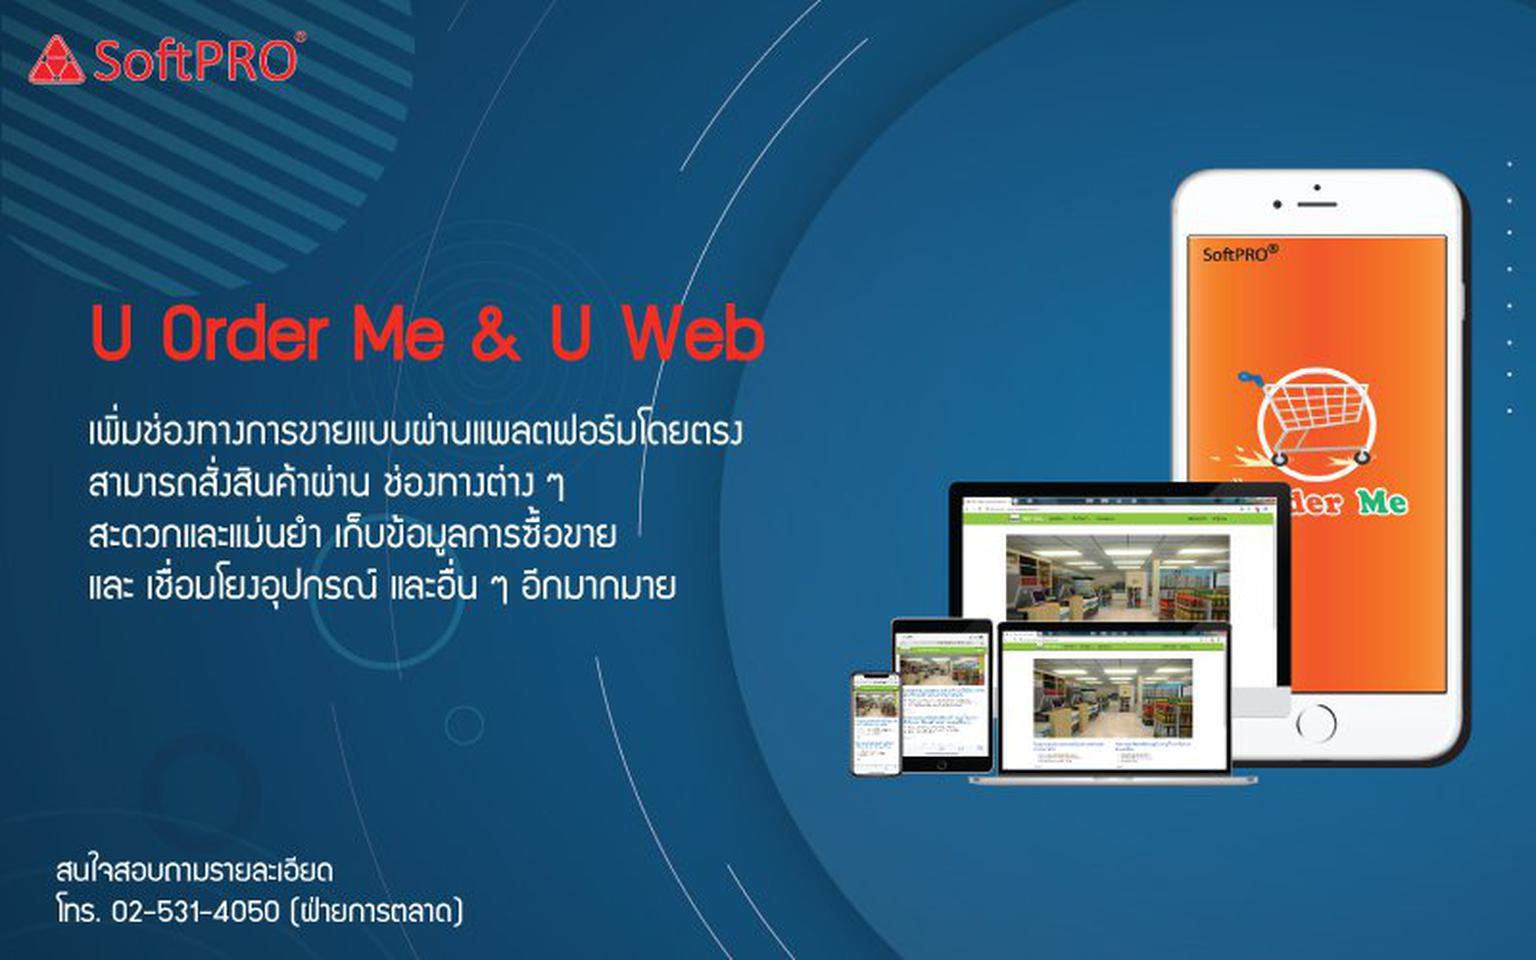 UOrderMe/UWeb ที่เป็นเครื่องมือให้ผู้ประกอบการ หรือเจ้าของสินค้าขายสินค้าออนไลน์ ผ่าน Application บนมือถือ หรือเวปไซด์ รูปที่ 1